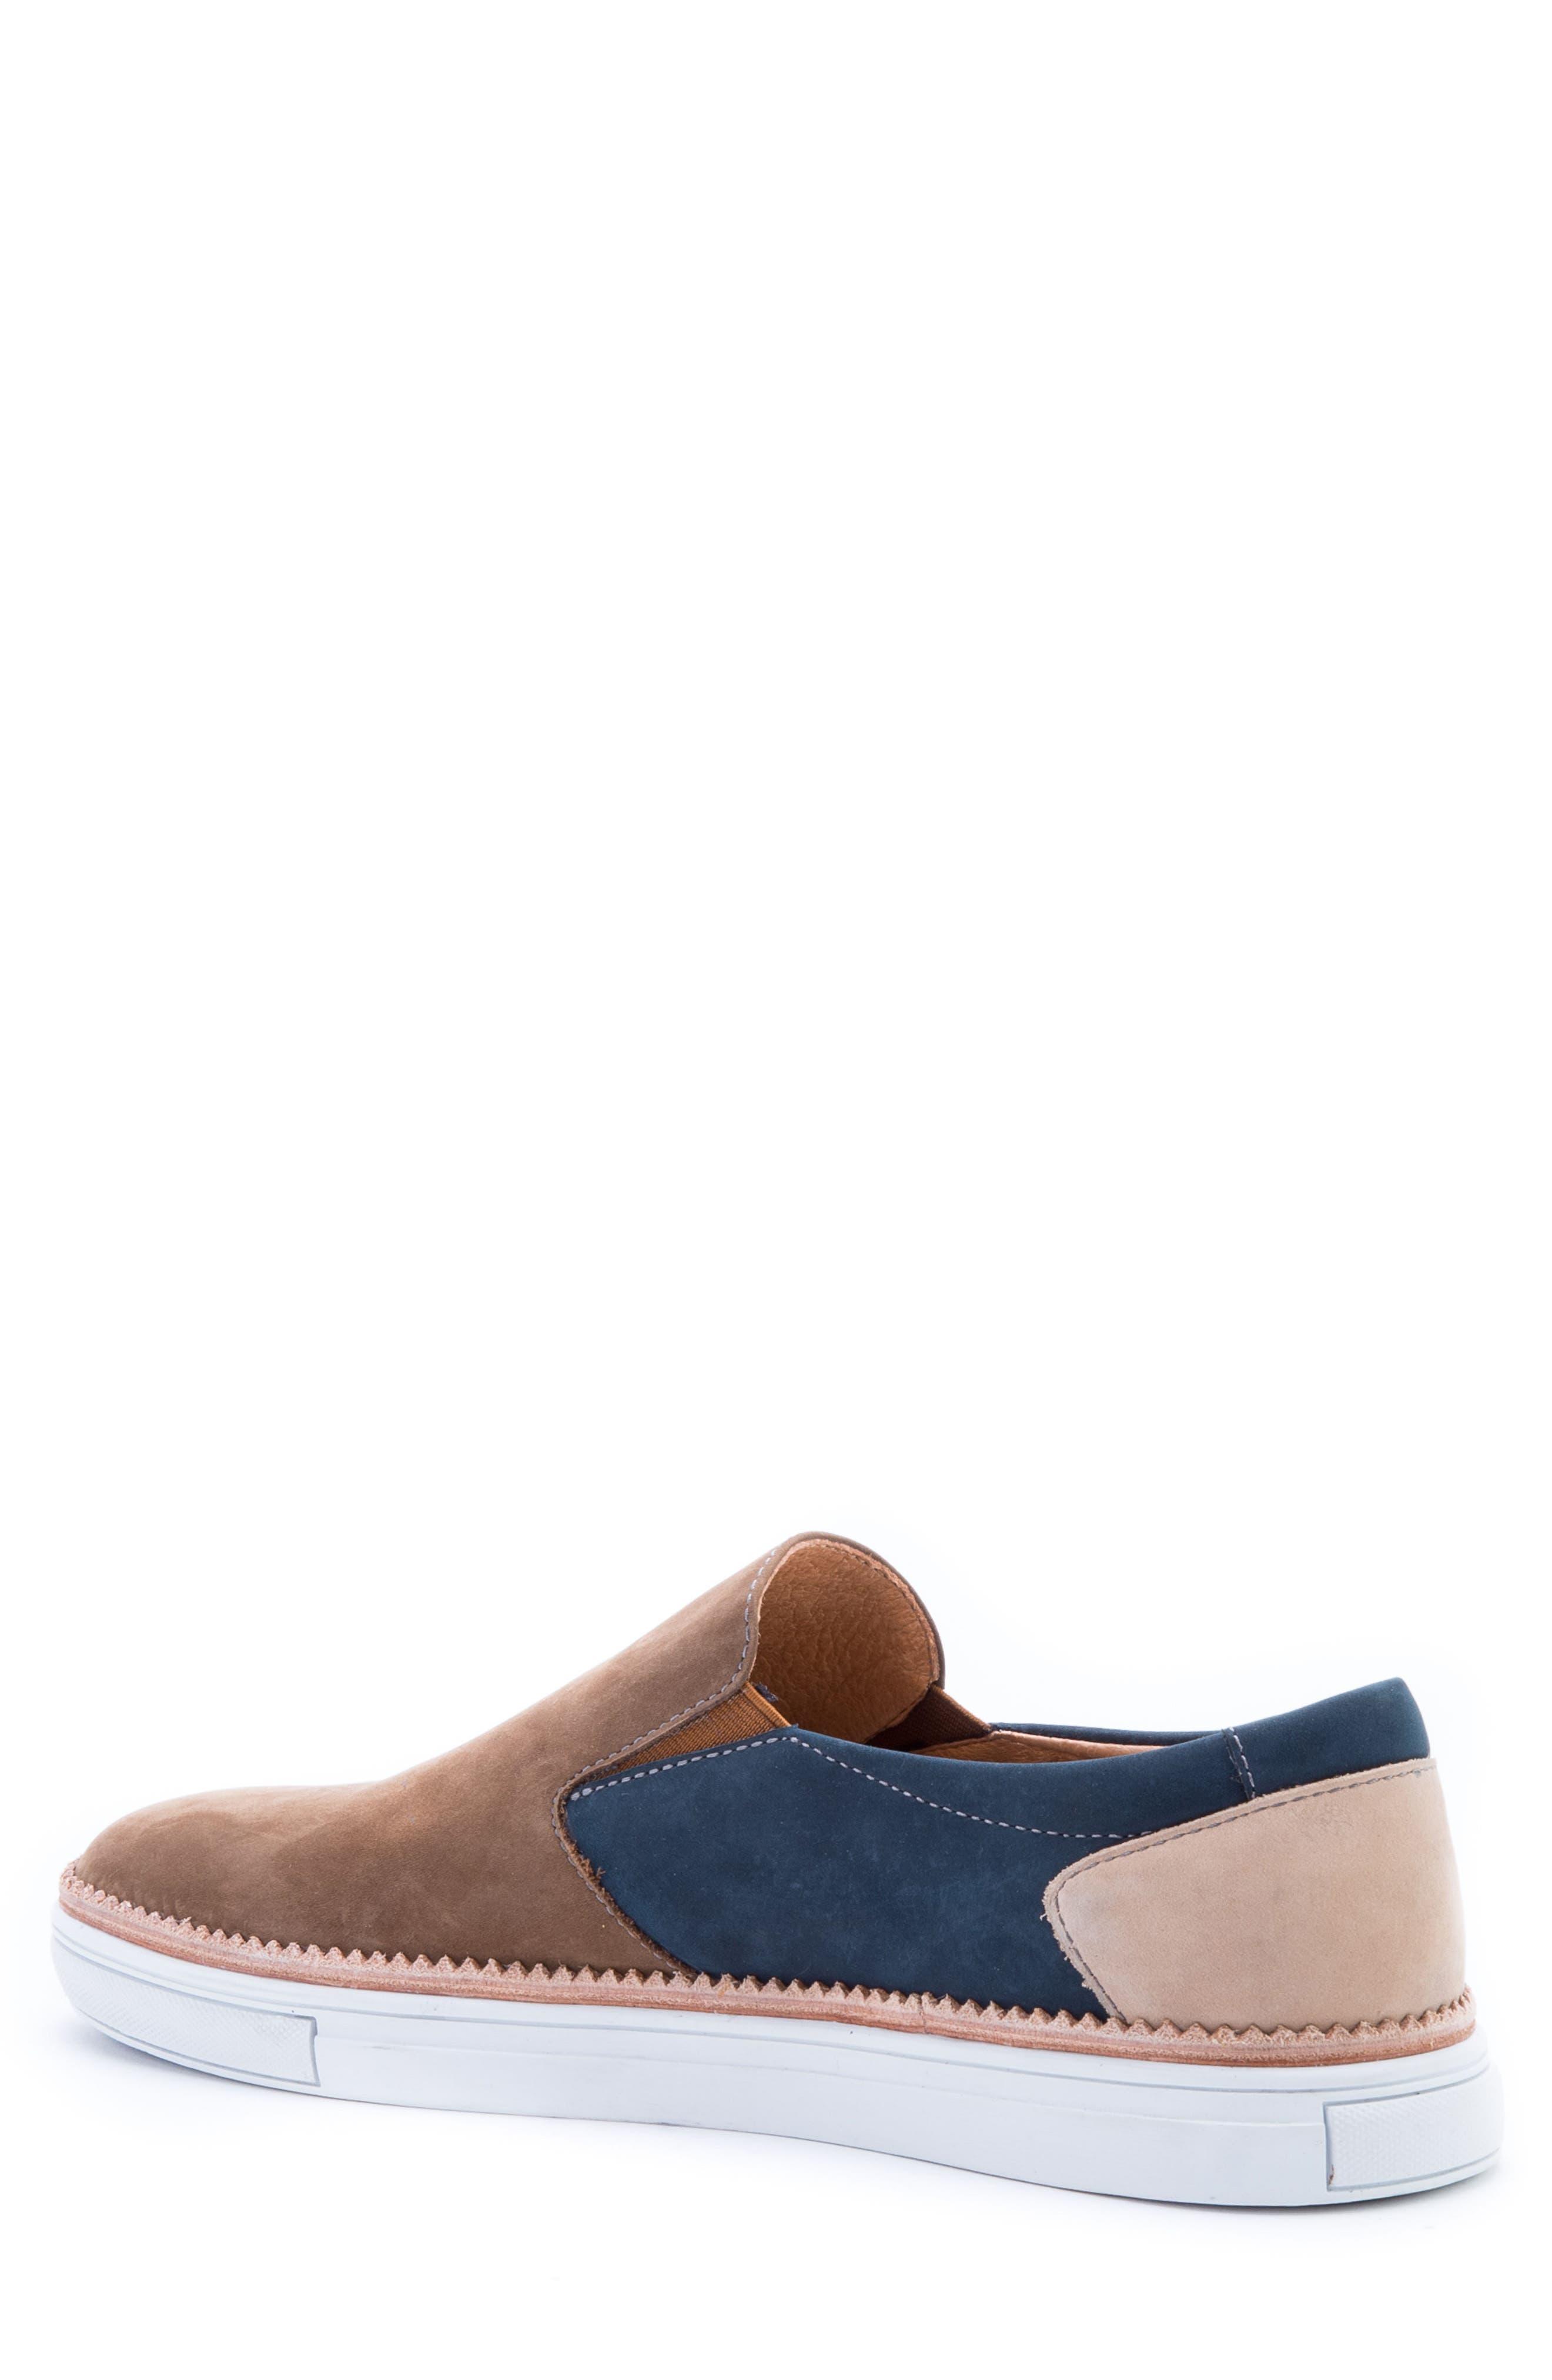 Rivera Colorblocked Slip-On Sneaker,                             Alternate thumbnail 2, color,                             COGNAC SUEDE